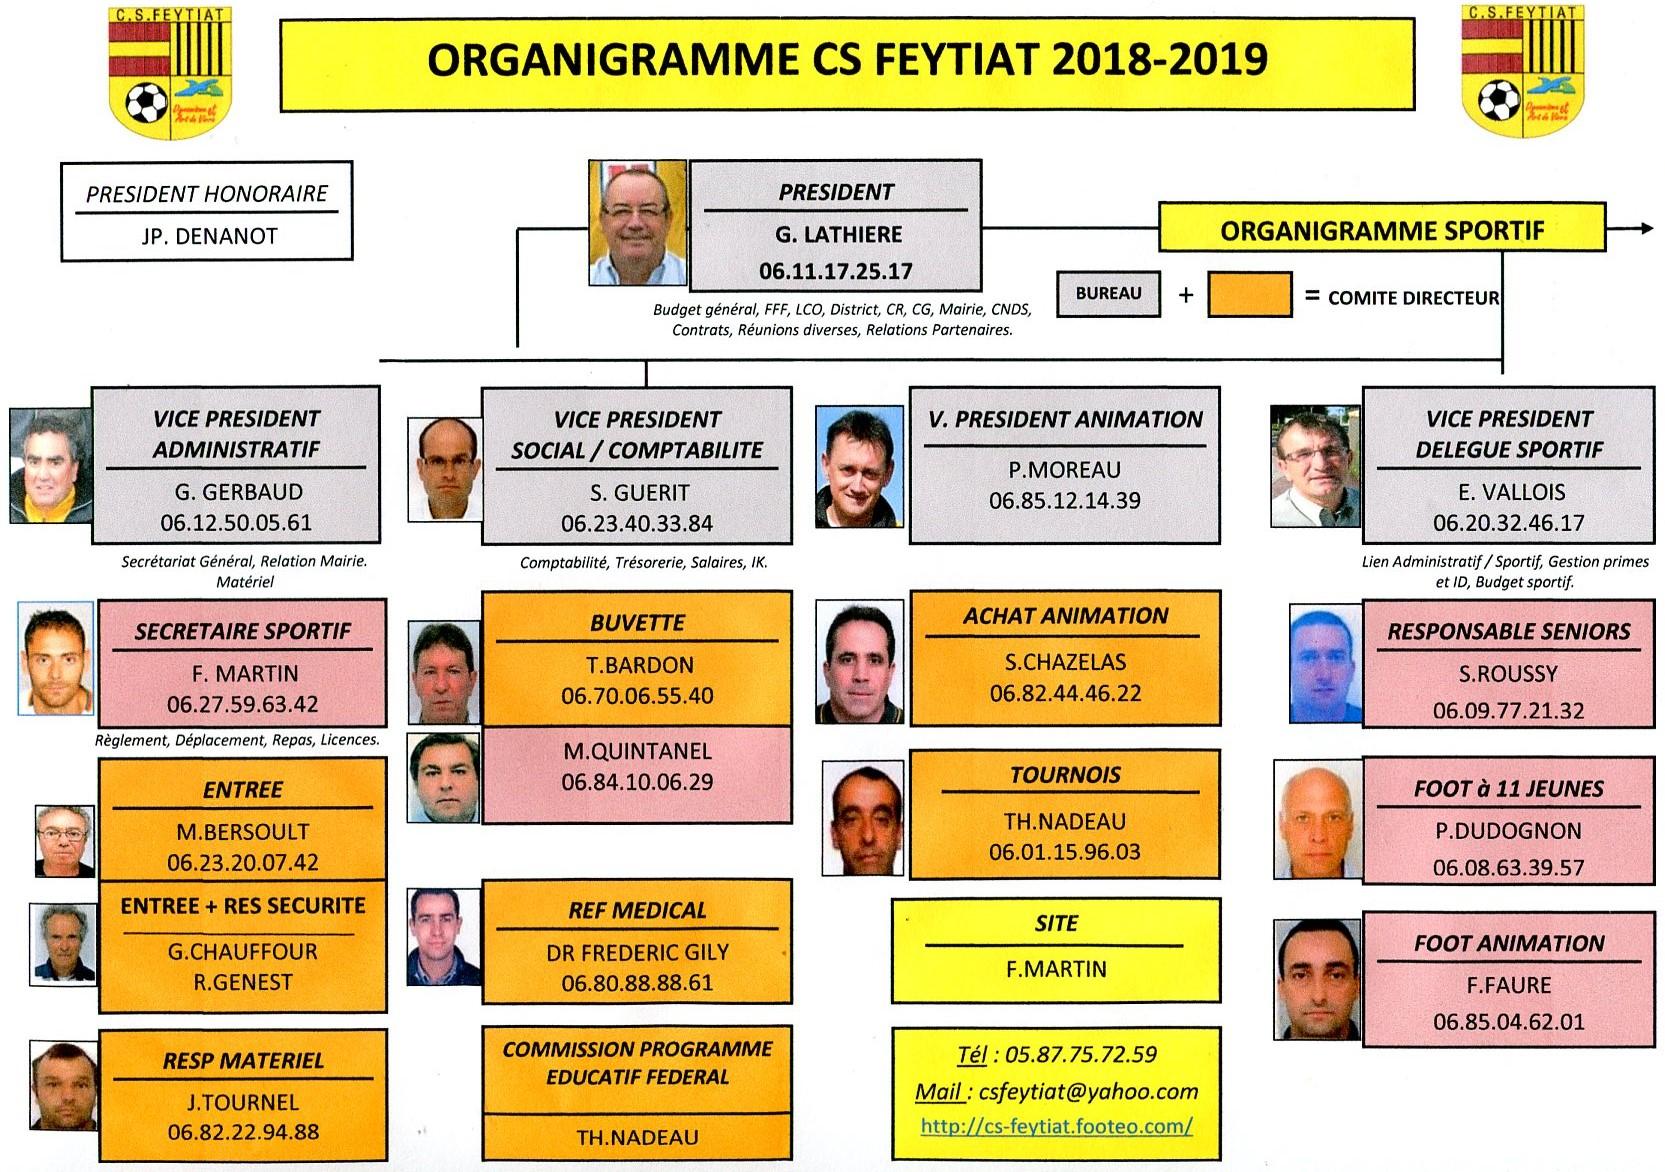 organigramme 2018.jpg